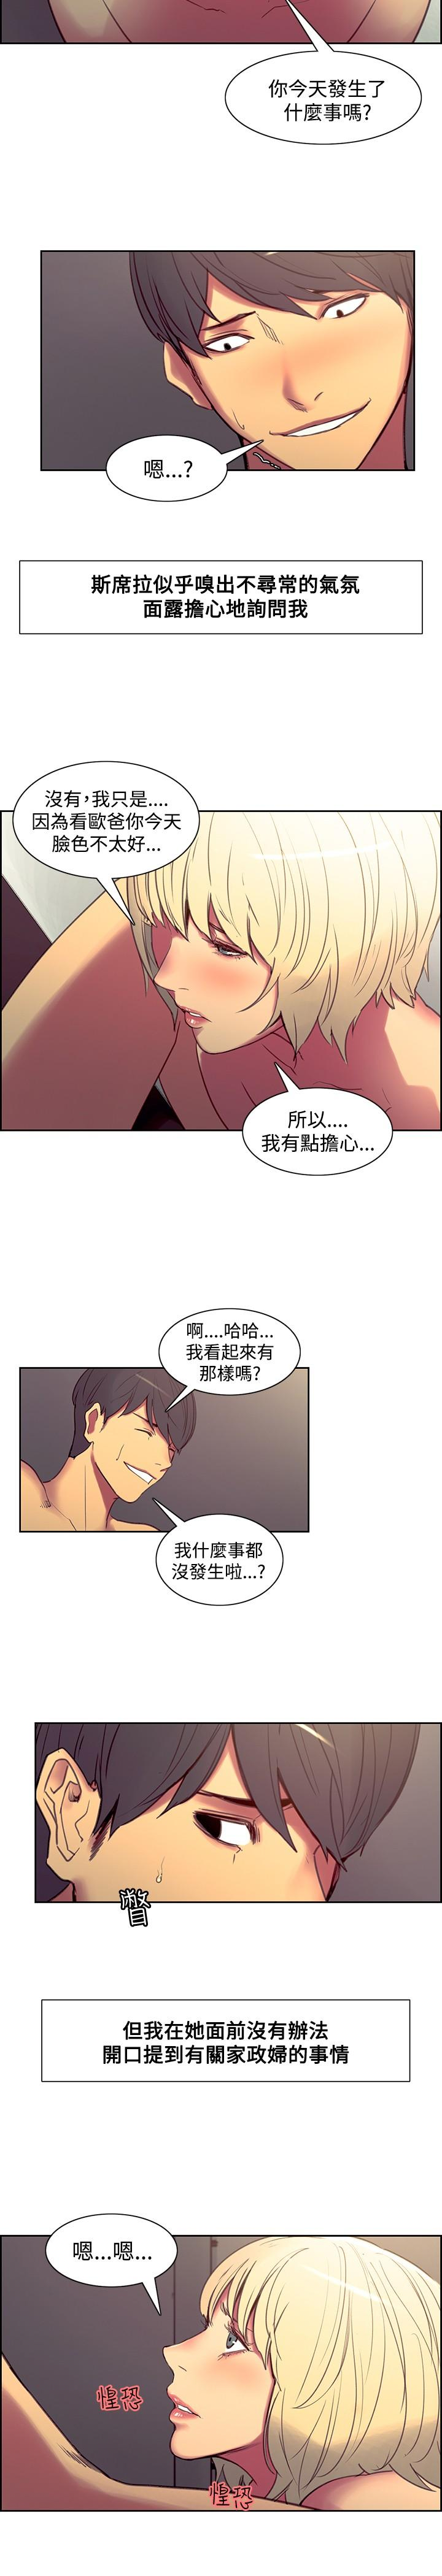 Domesticate the Housekeeper 调教家政妇 Ch.29~39 164